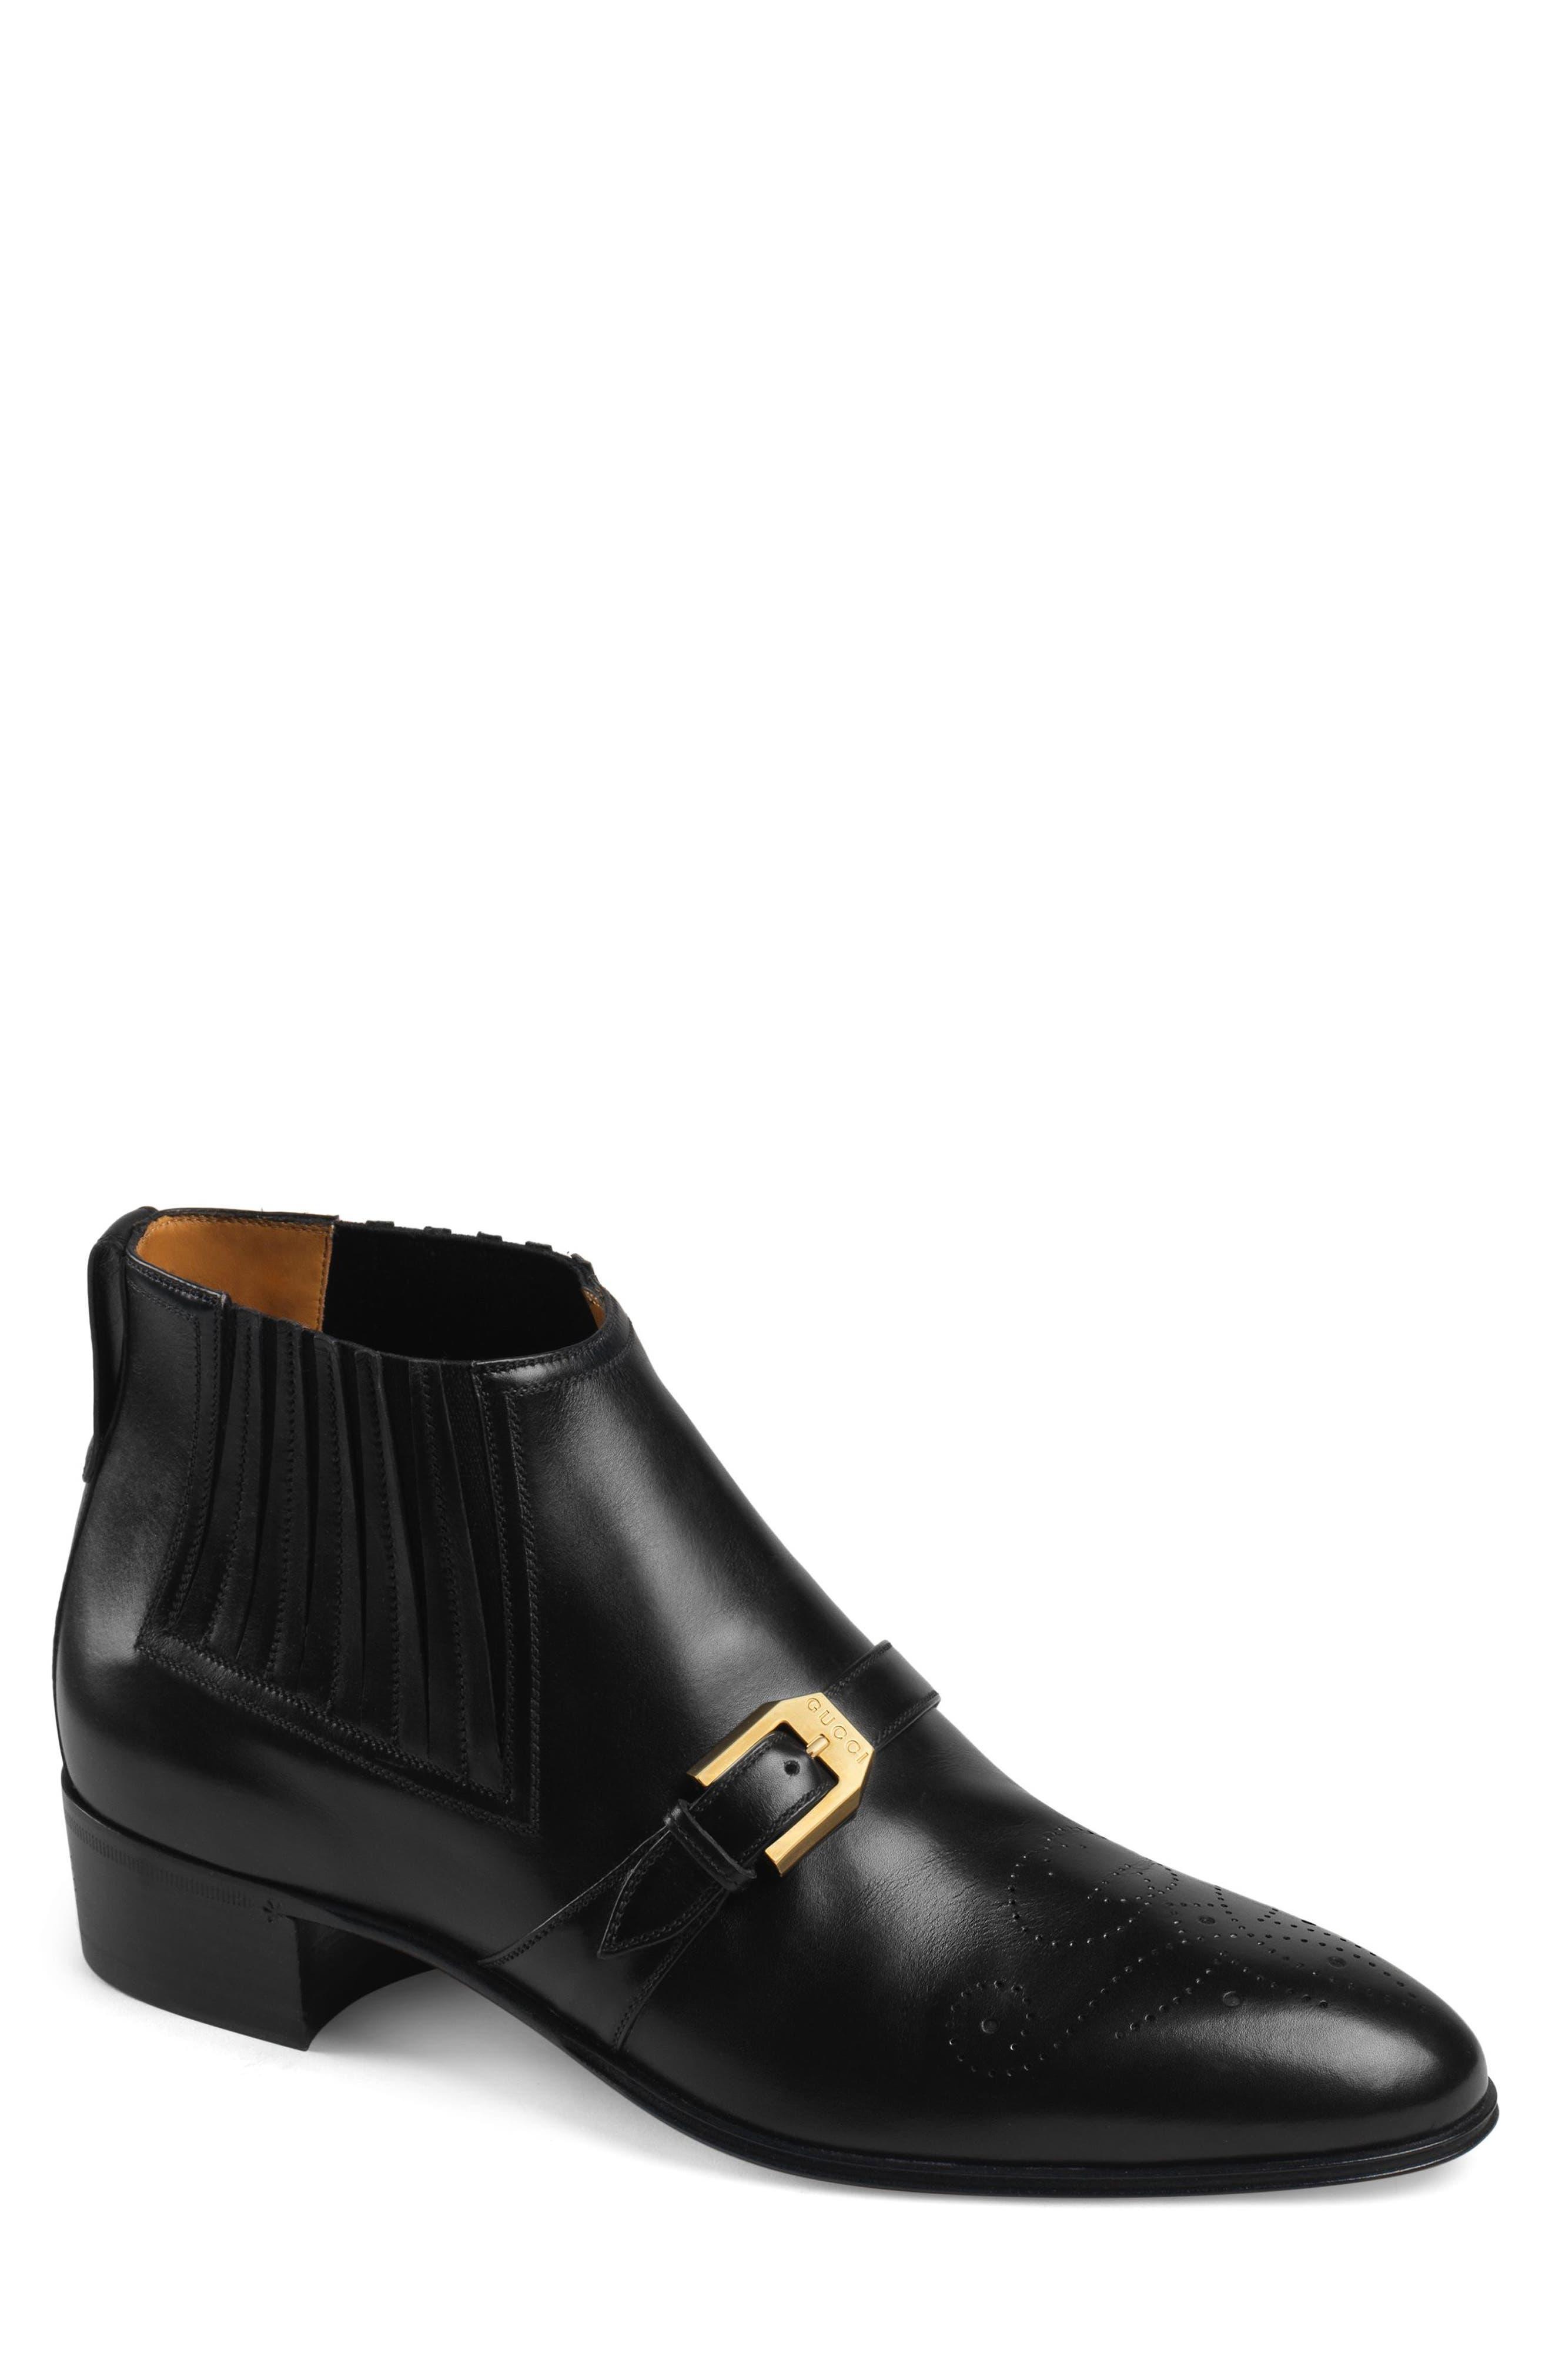 Gucci Worsh Chelsea Boot, Black